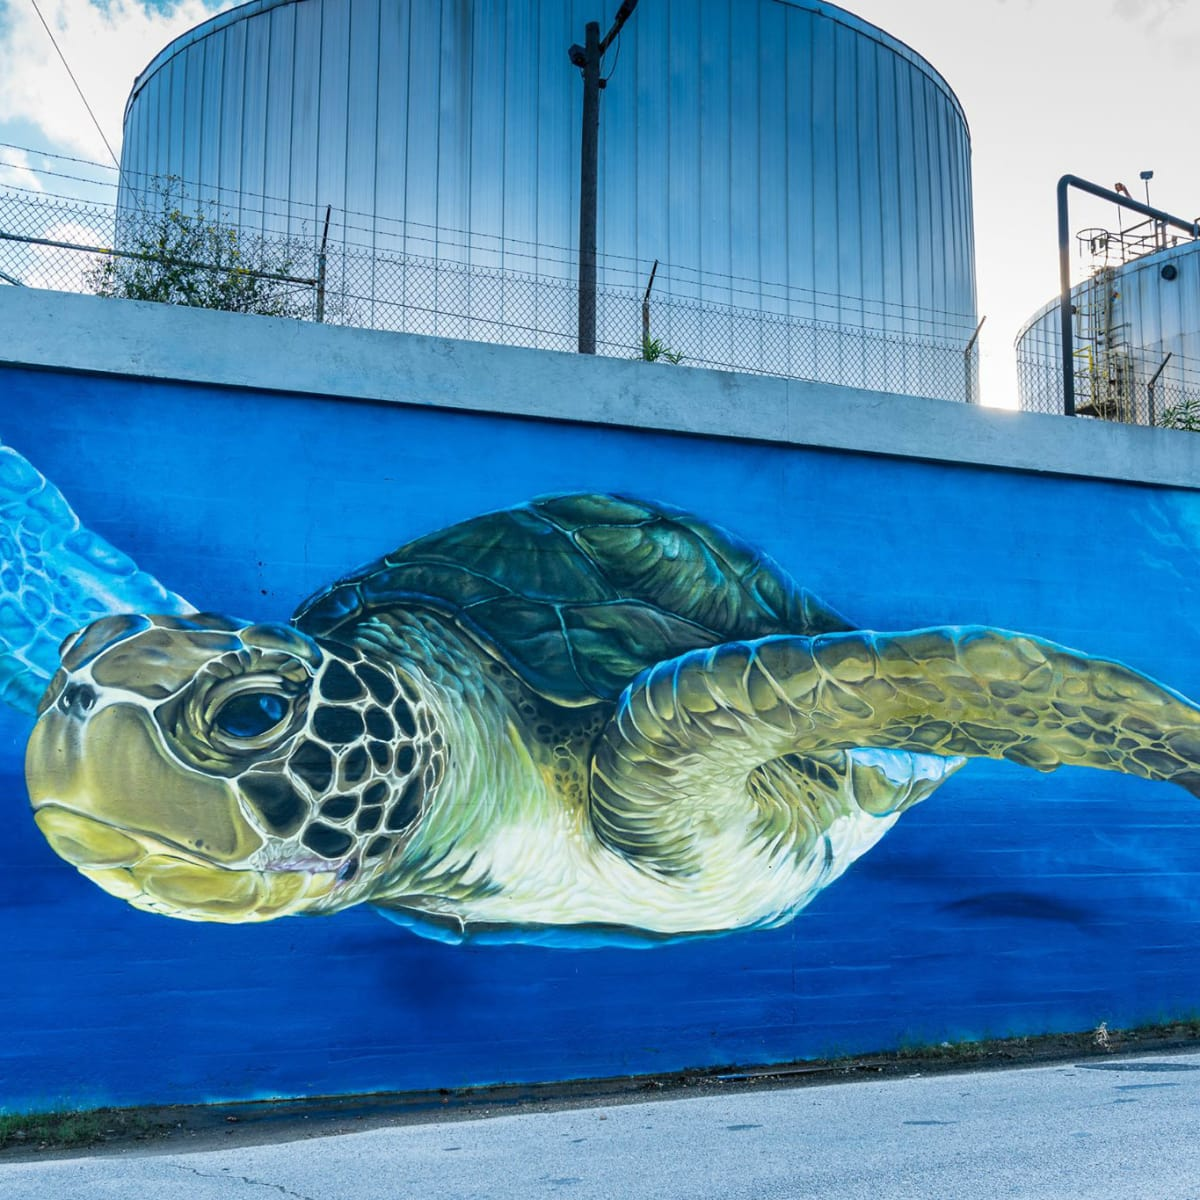 Turtle Soup downtown houston art mural turtle